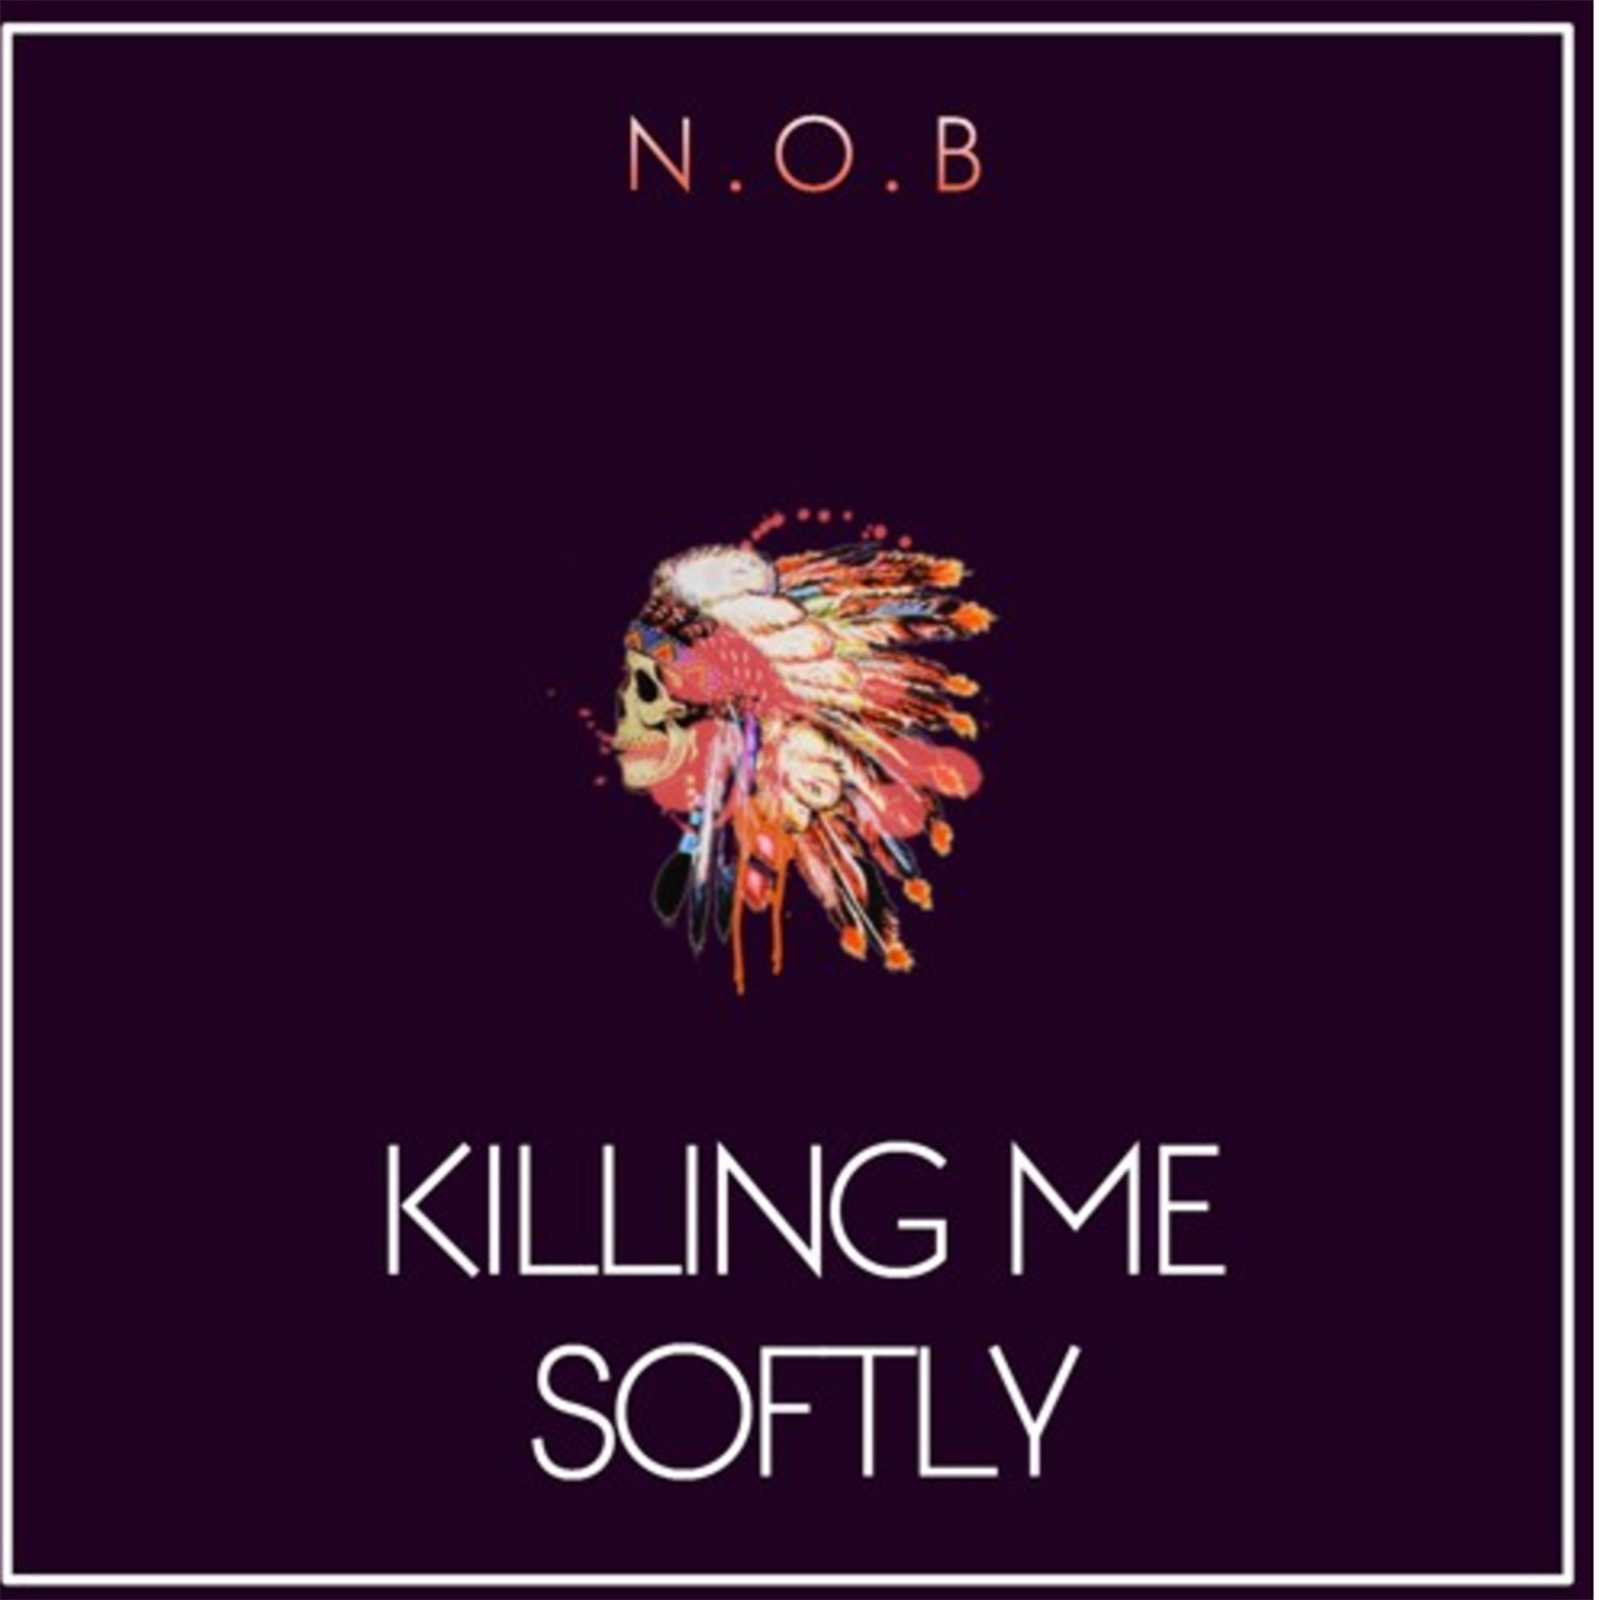 Killing Me Softly by N.O.B